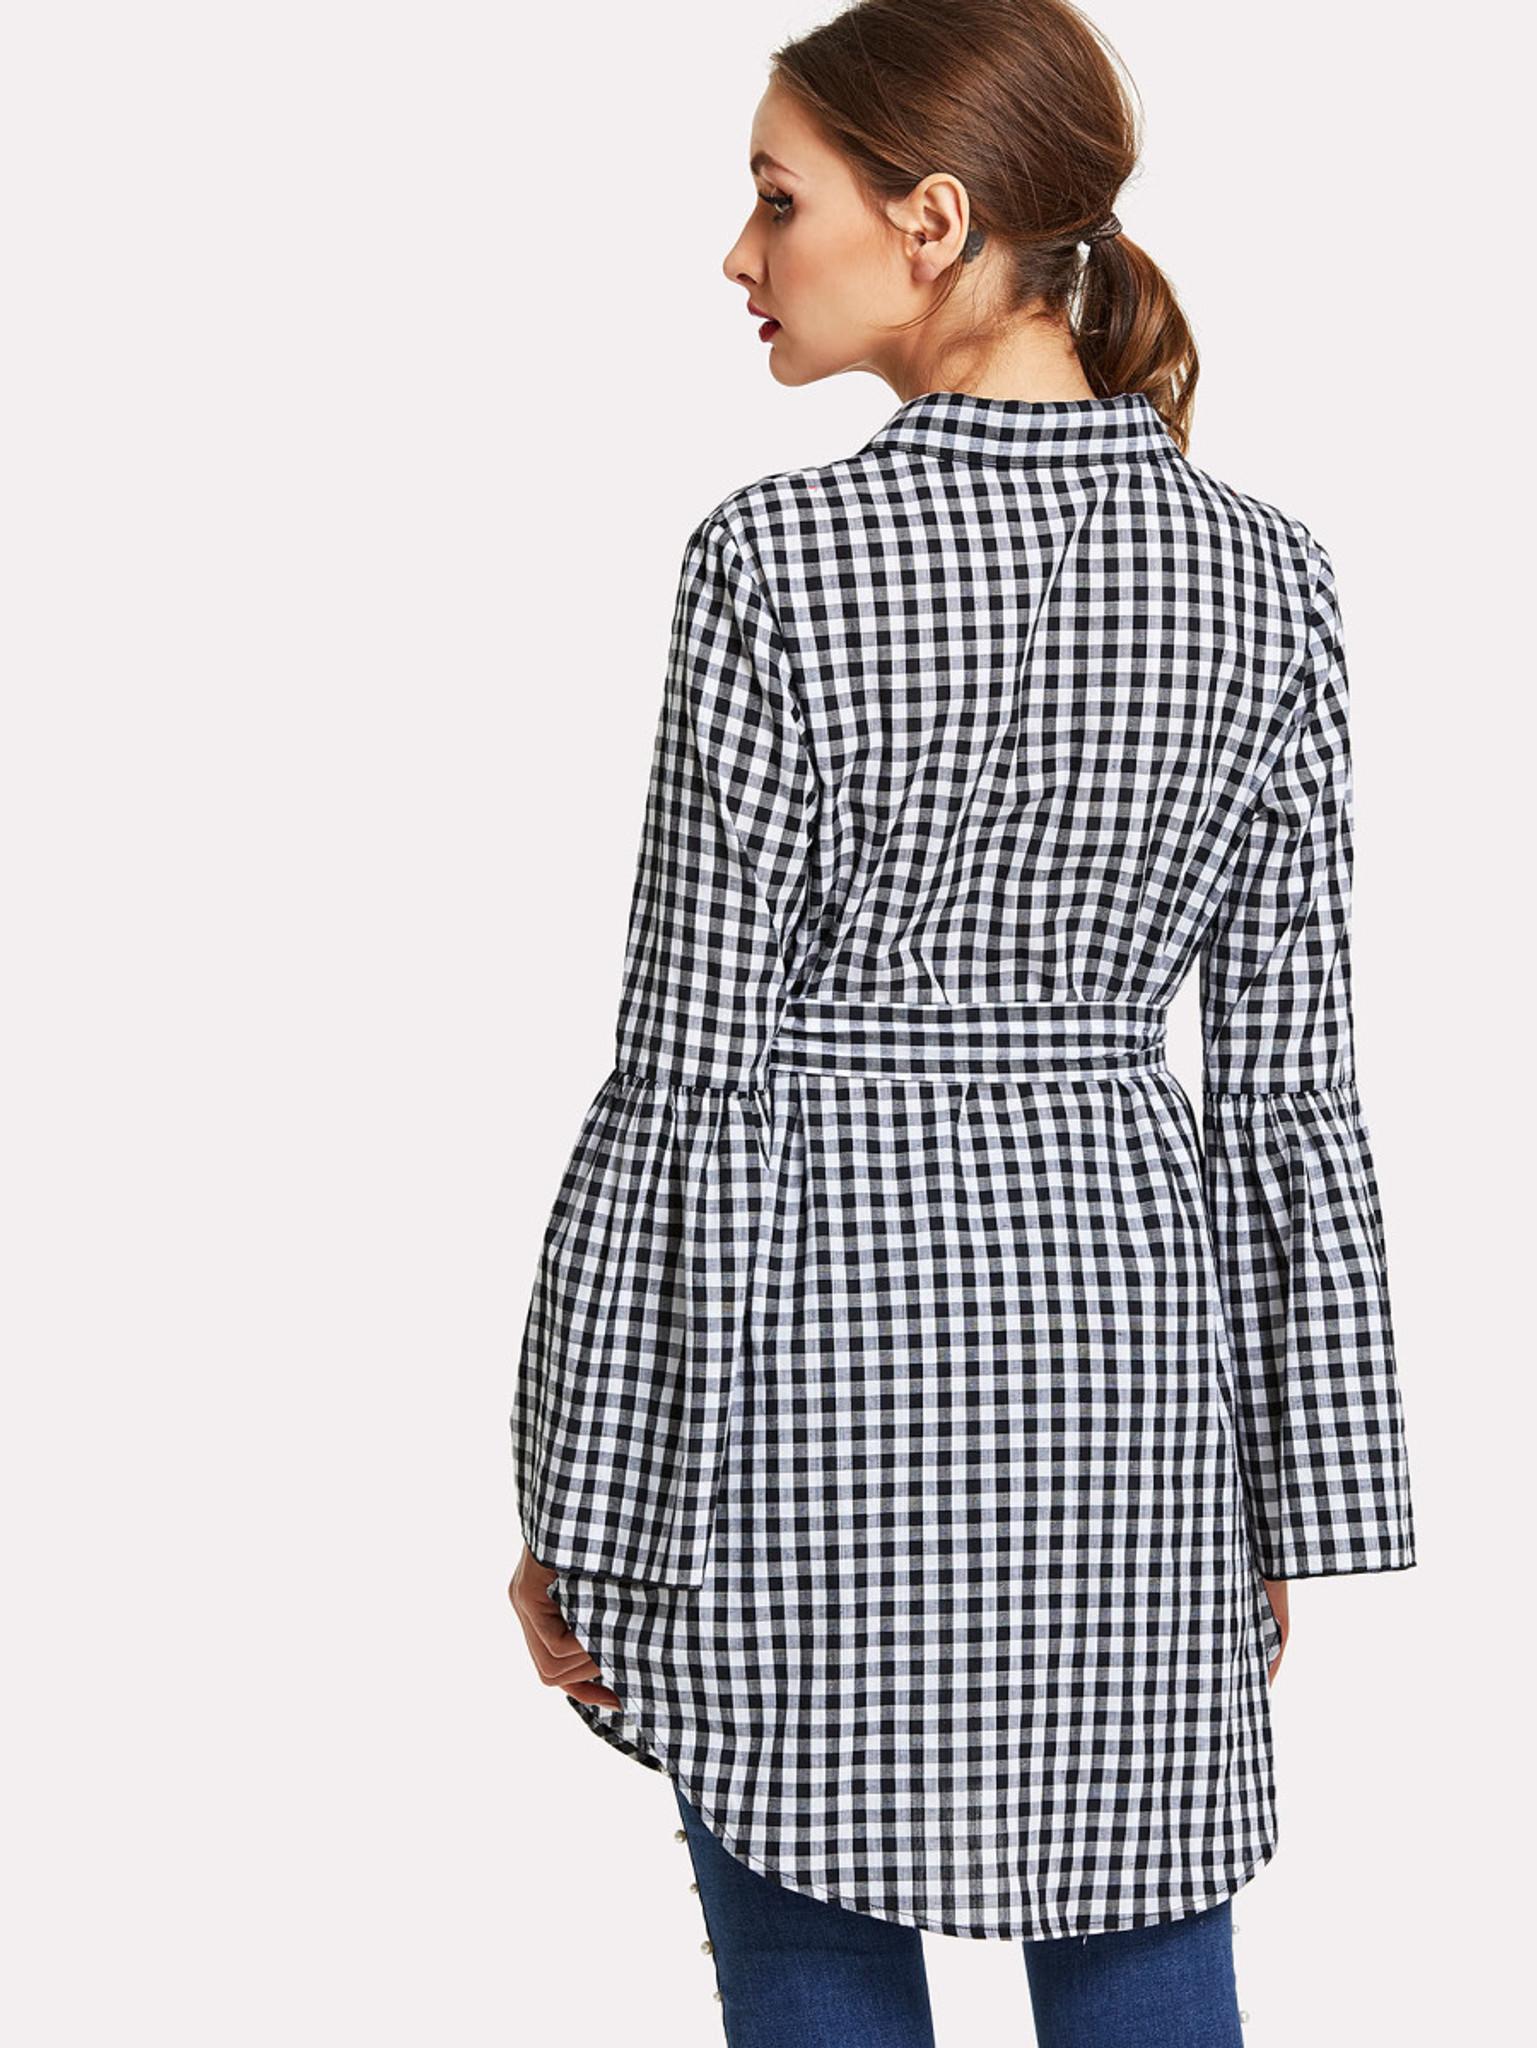 e195472c95ea Black And White Checked Shirts Womens | Saddha